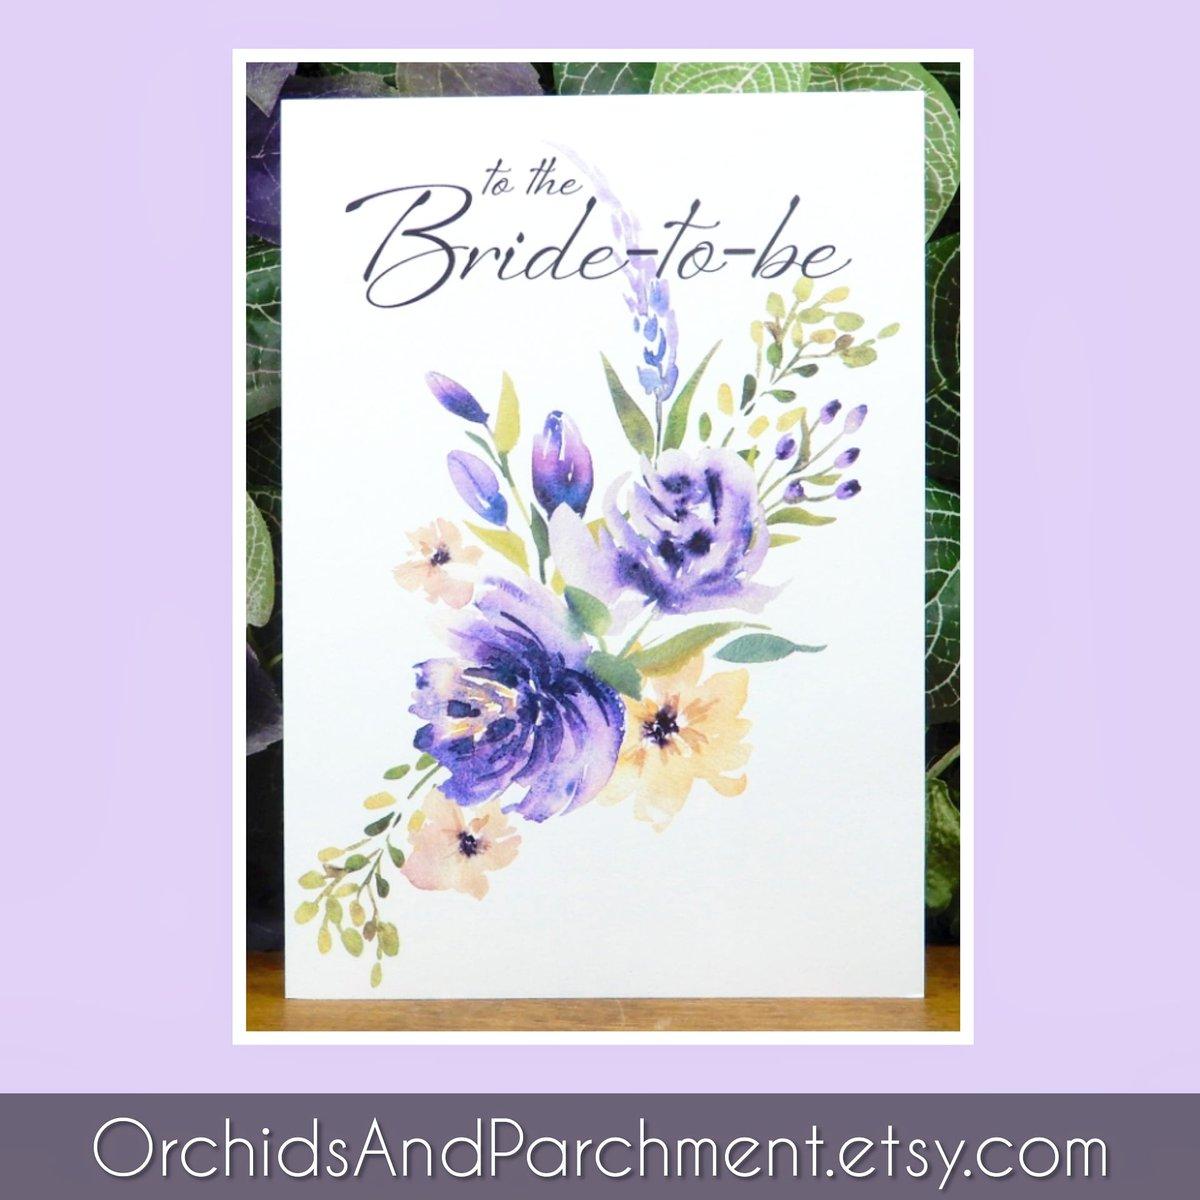 Printable Bride-to-be Card ☆ Link in my bio ☆ #orchidsandparchment #etsy #printablecard #digitaldownload #greetingcard #greetingcards #sendmail #snailmail #cardsdomore #bridetobe #bridalshower #bridalgift #bride #floral #floralcard #flowers https://t.co/o95rBFua6k